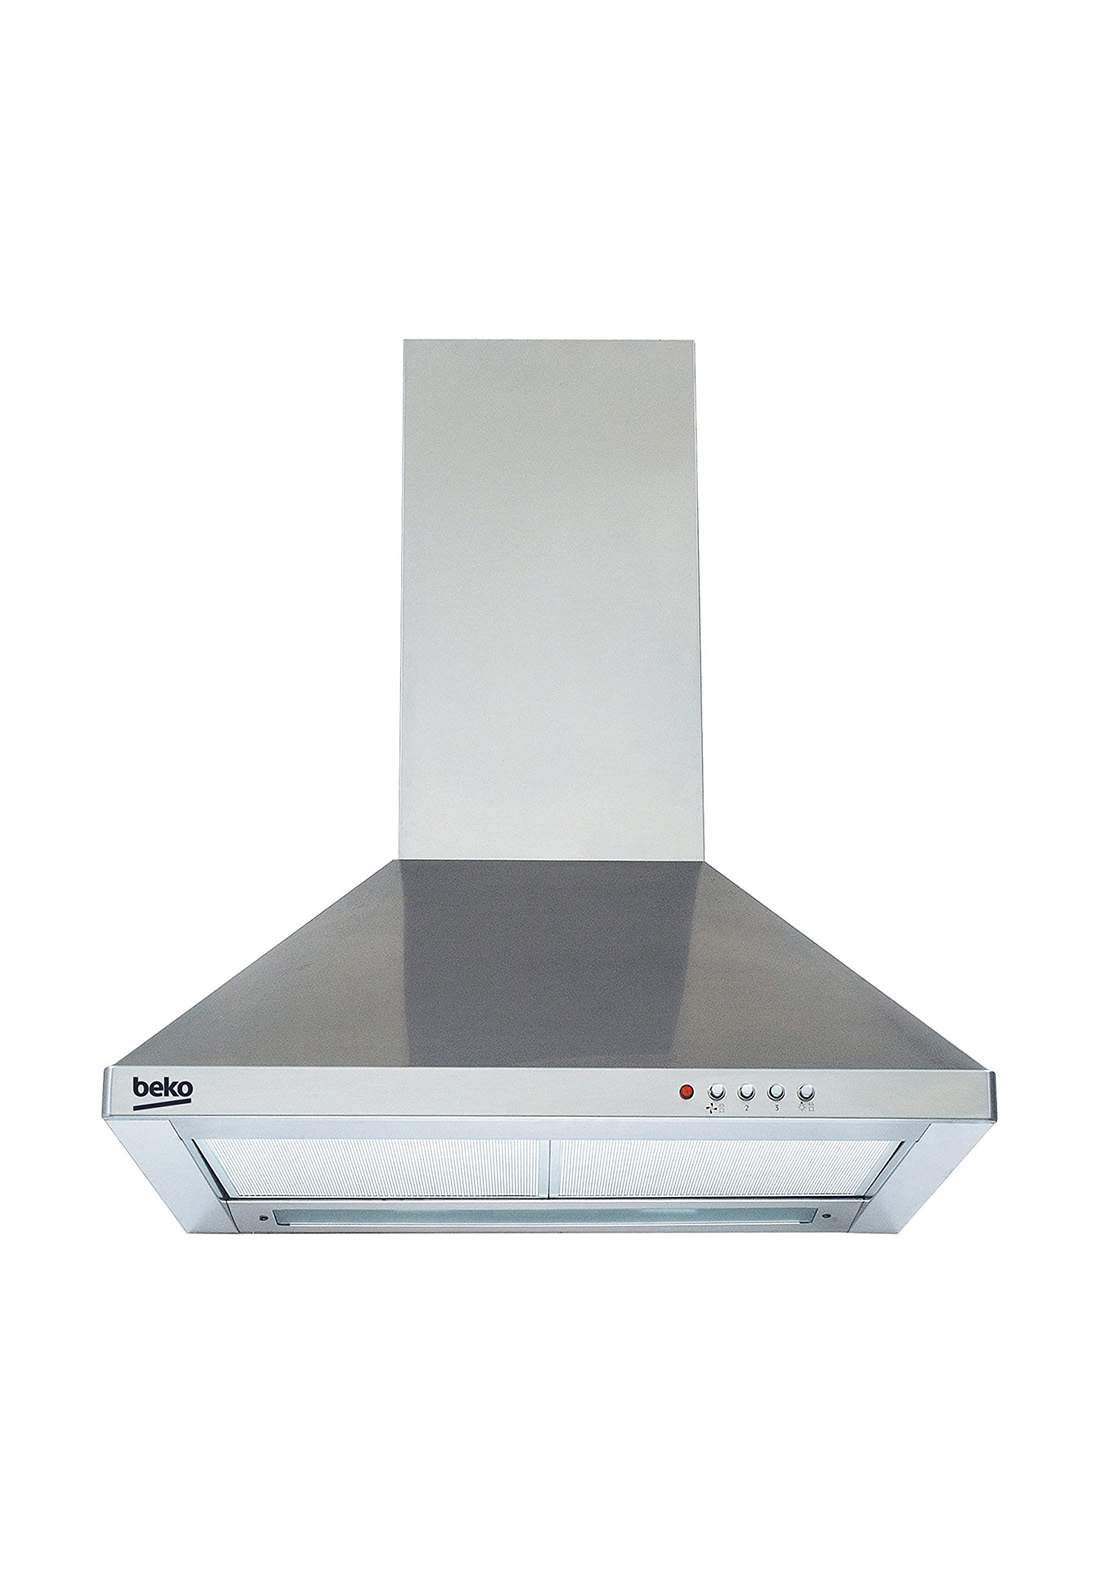 Beko CWB 9420 X Wall-mounted Stainless steel - Silver مرشحة